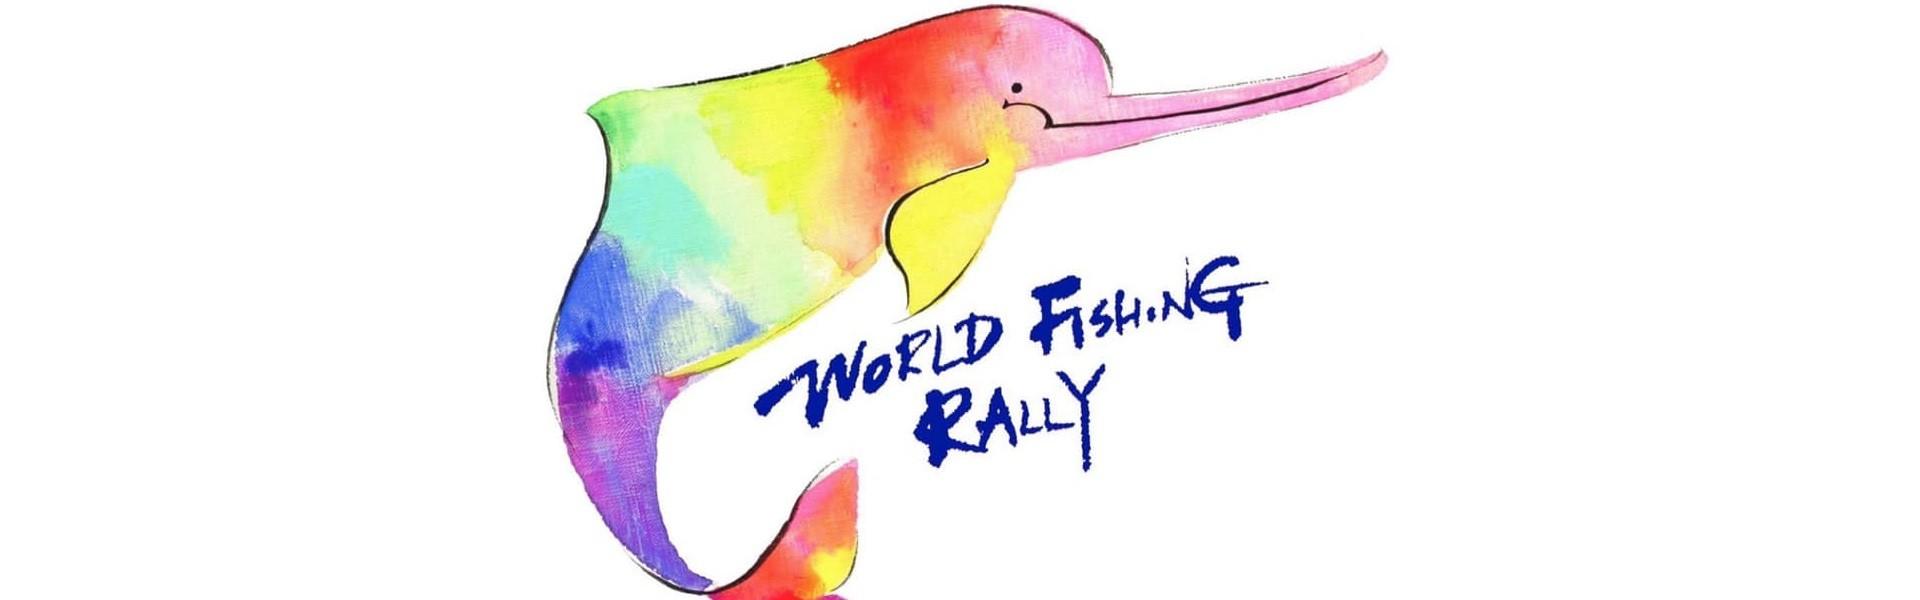 Great Amazon World Fishing Rally agita o rio Araguaia